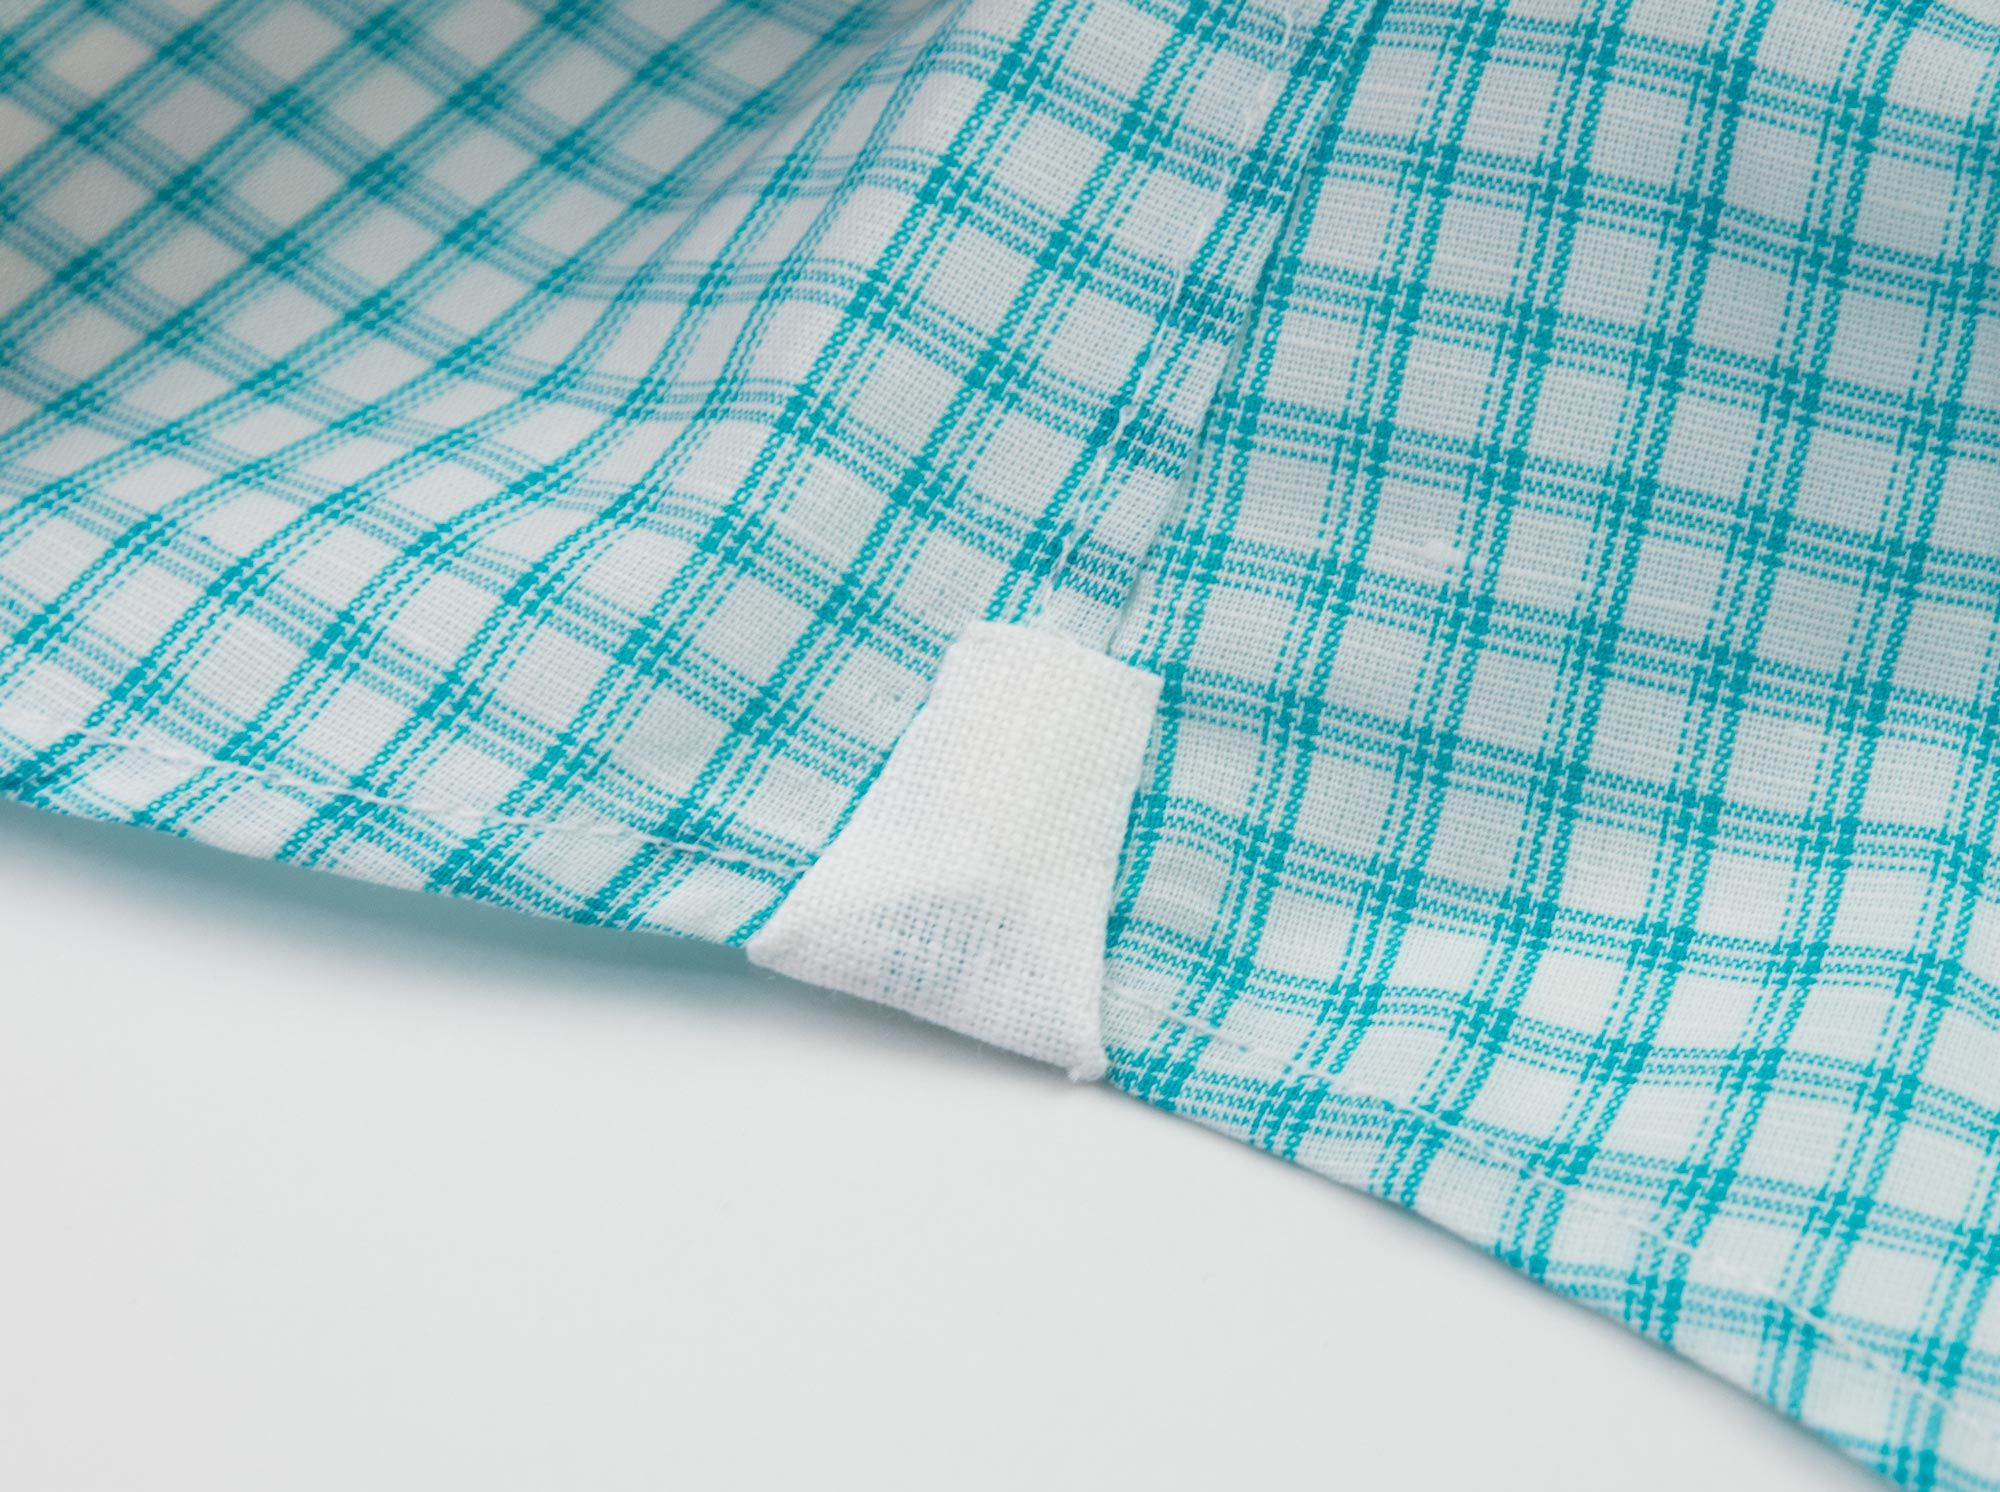 Hand sewn gussets, a hallmark of a well-made shirt